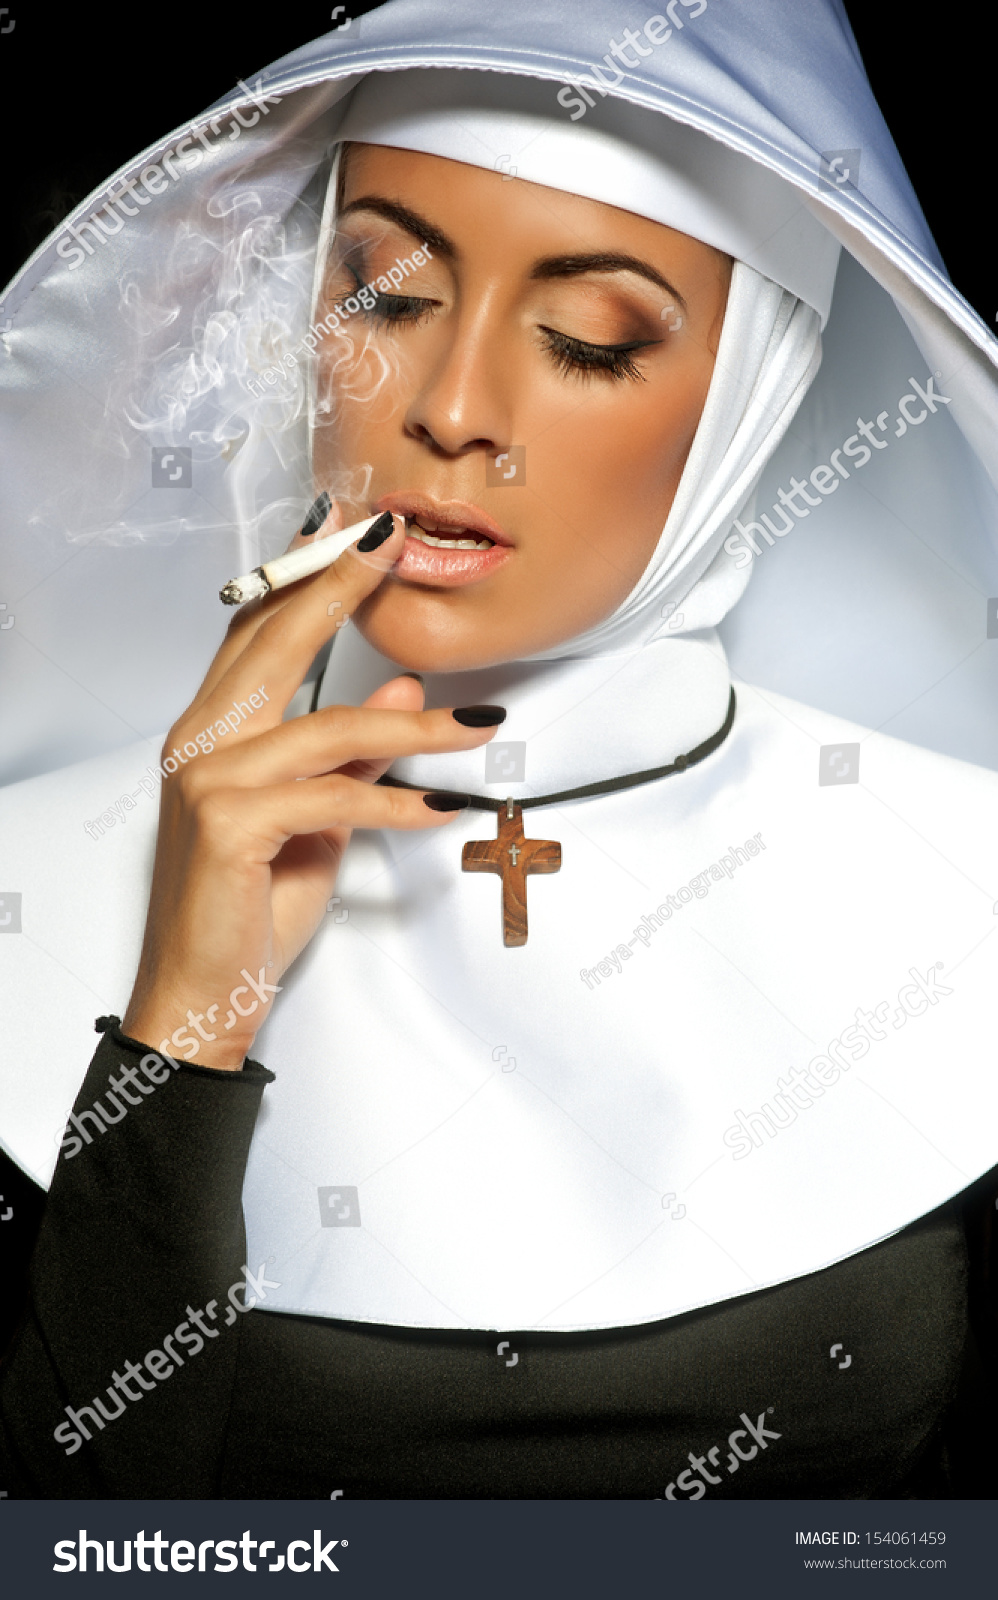 Черно белые фото монахини 16 фотография